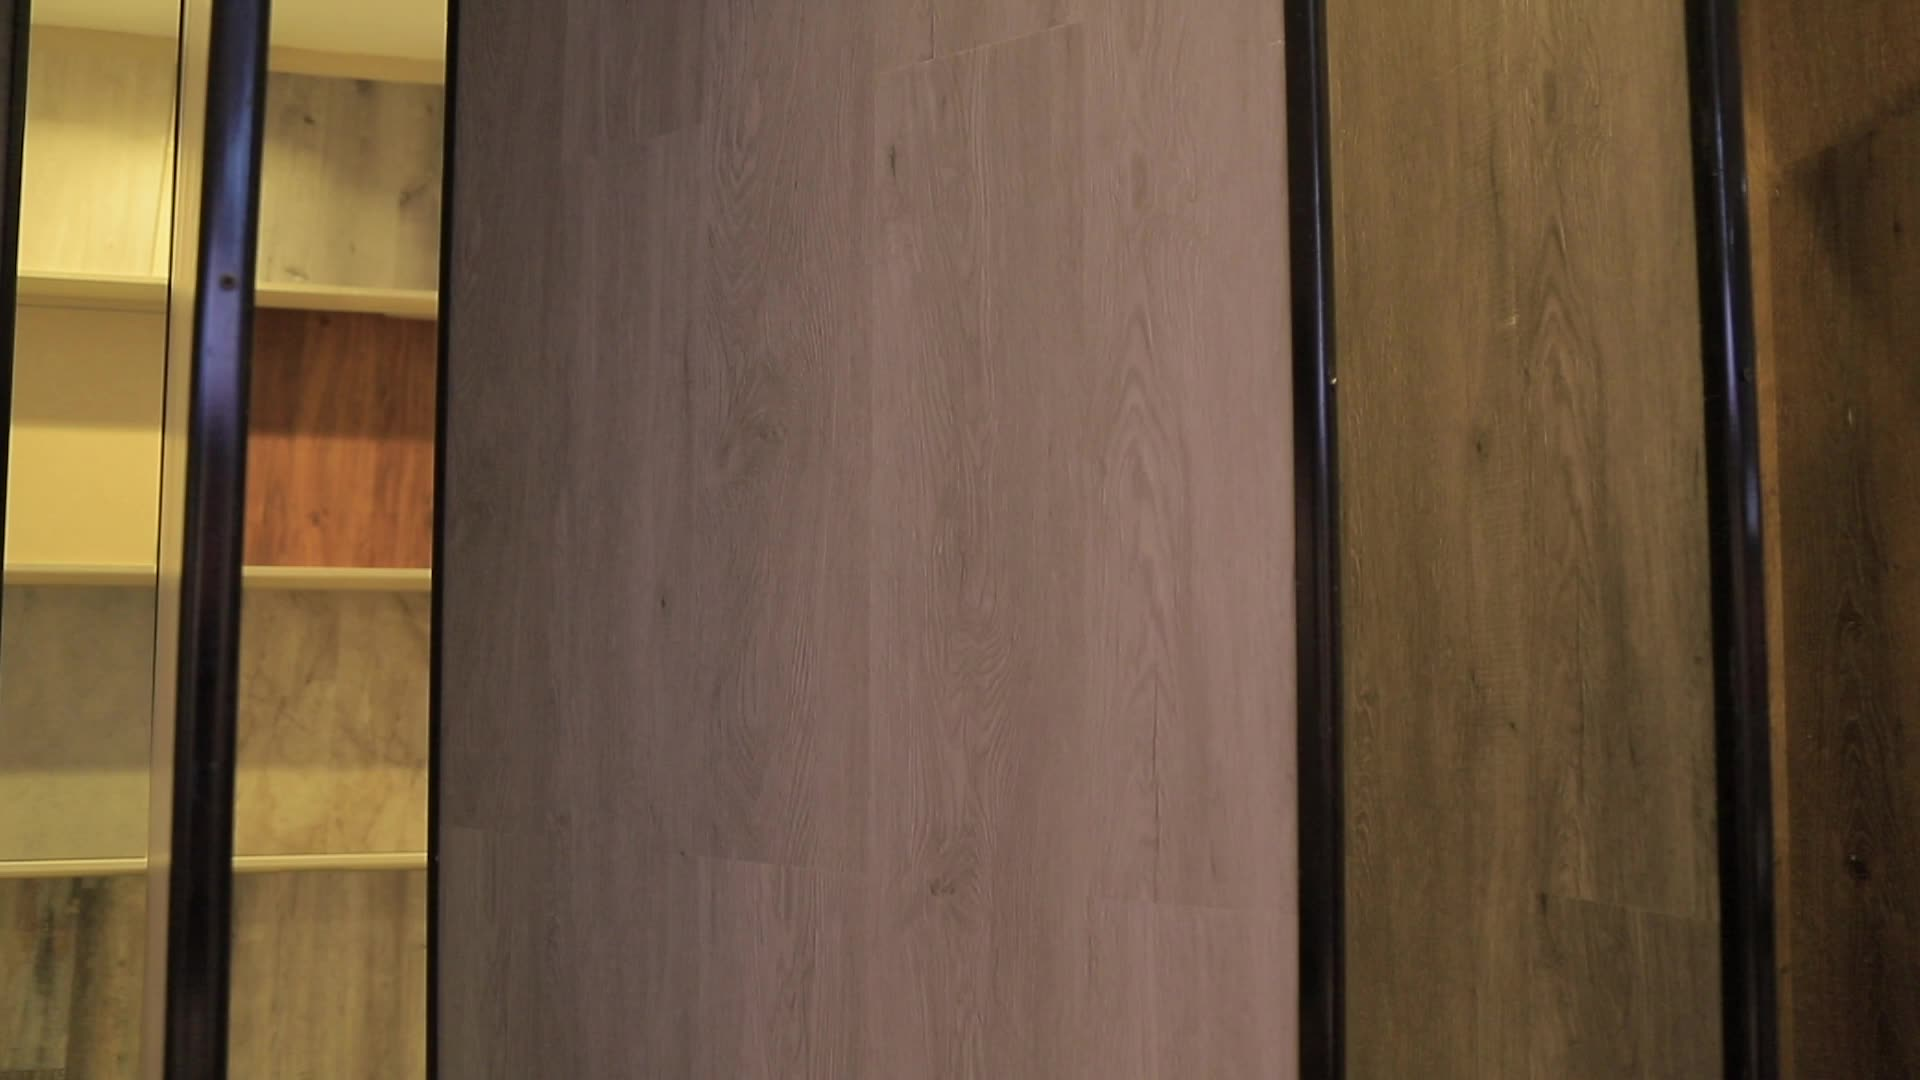 Bamboo Indoor Flooring  Natural color waterproof  Morden New Eco-Friendly Material Bamboo Flooring